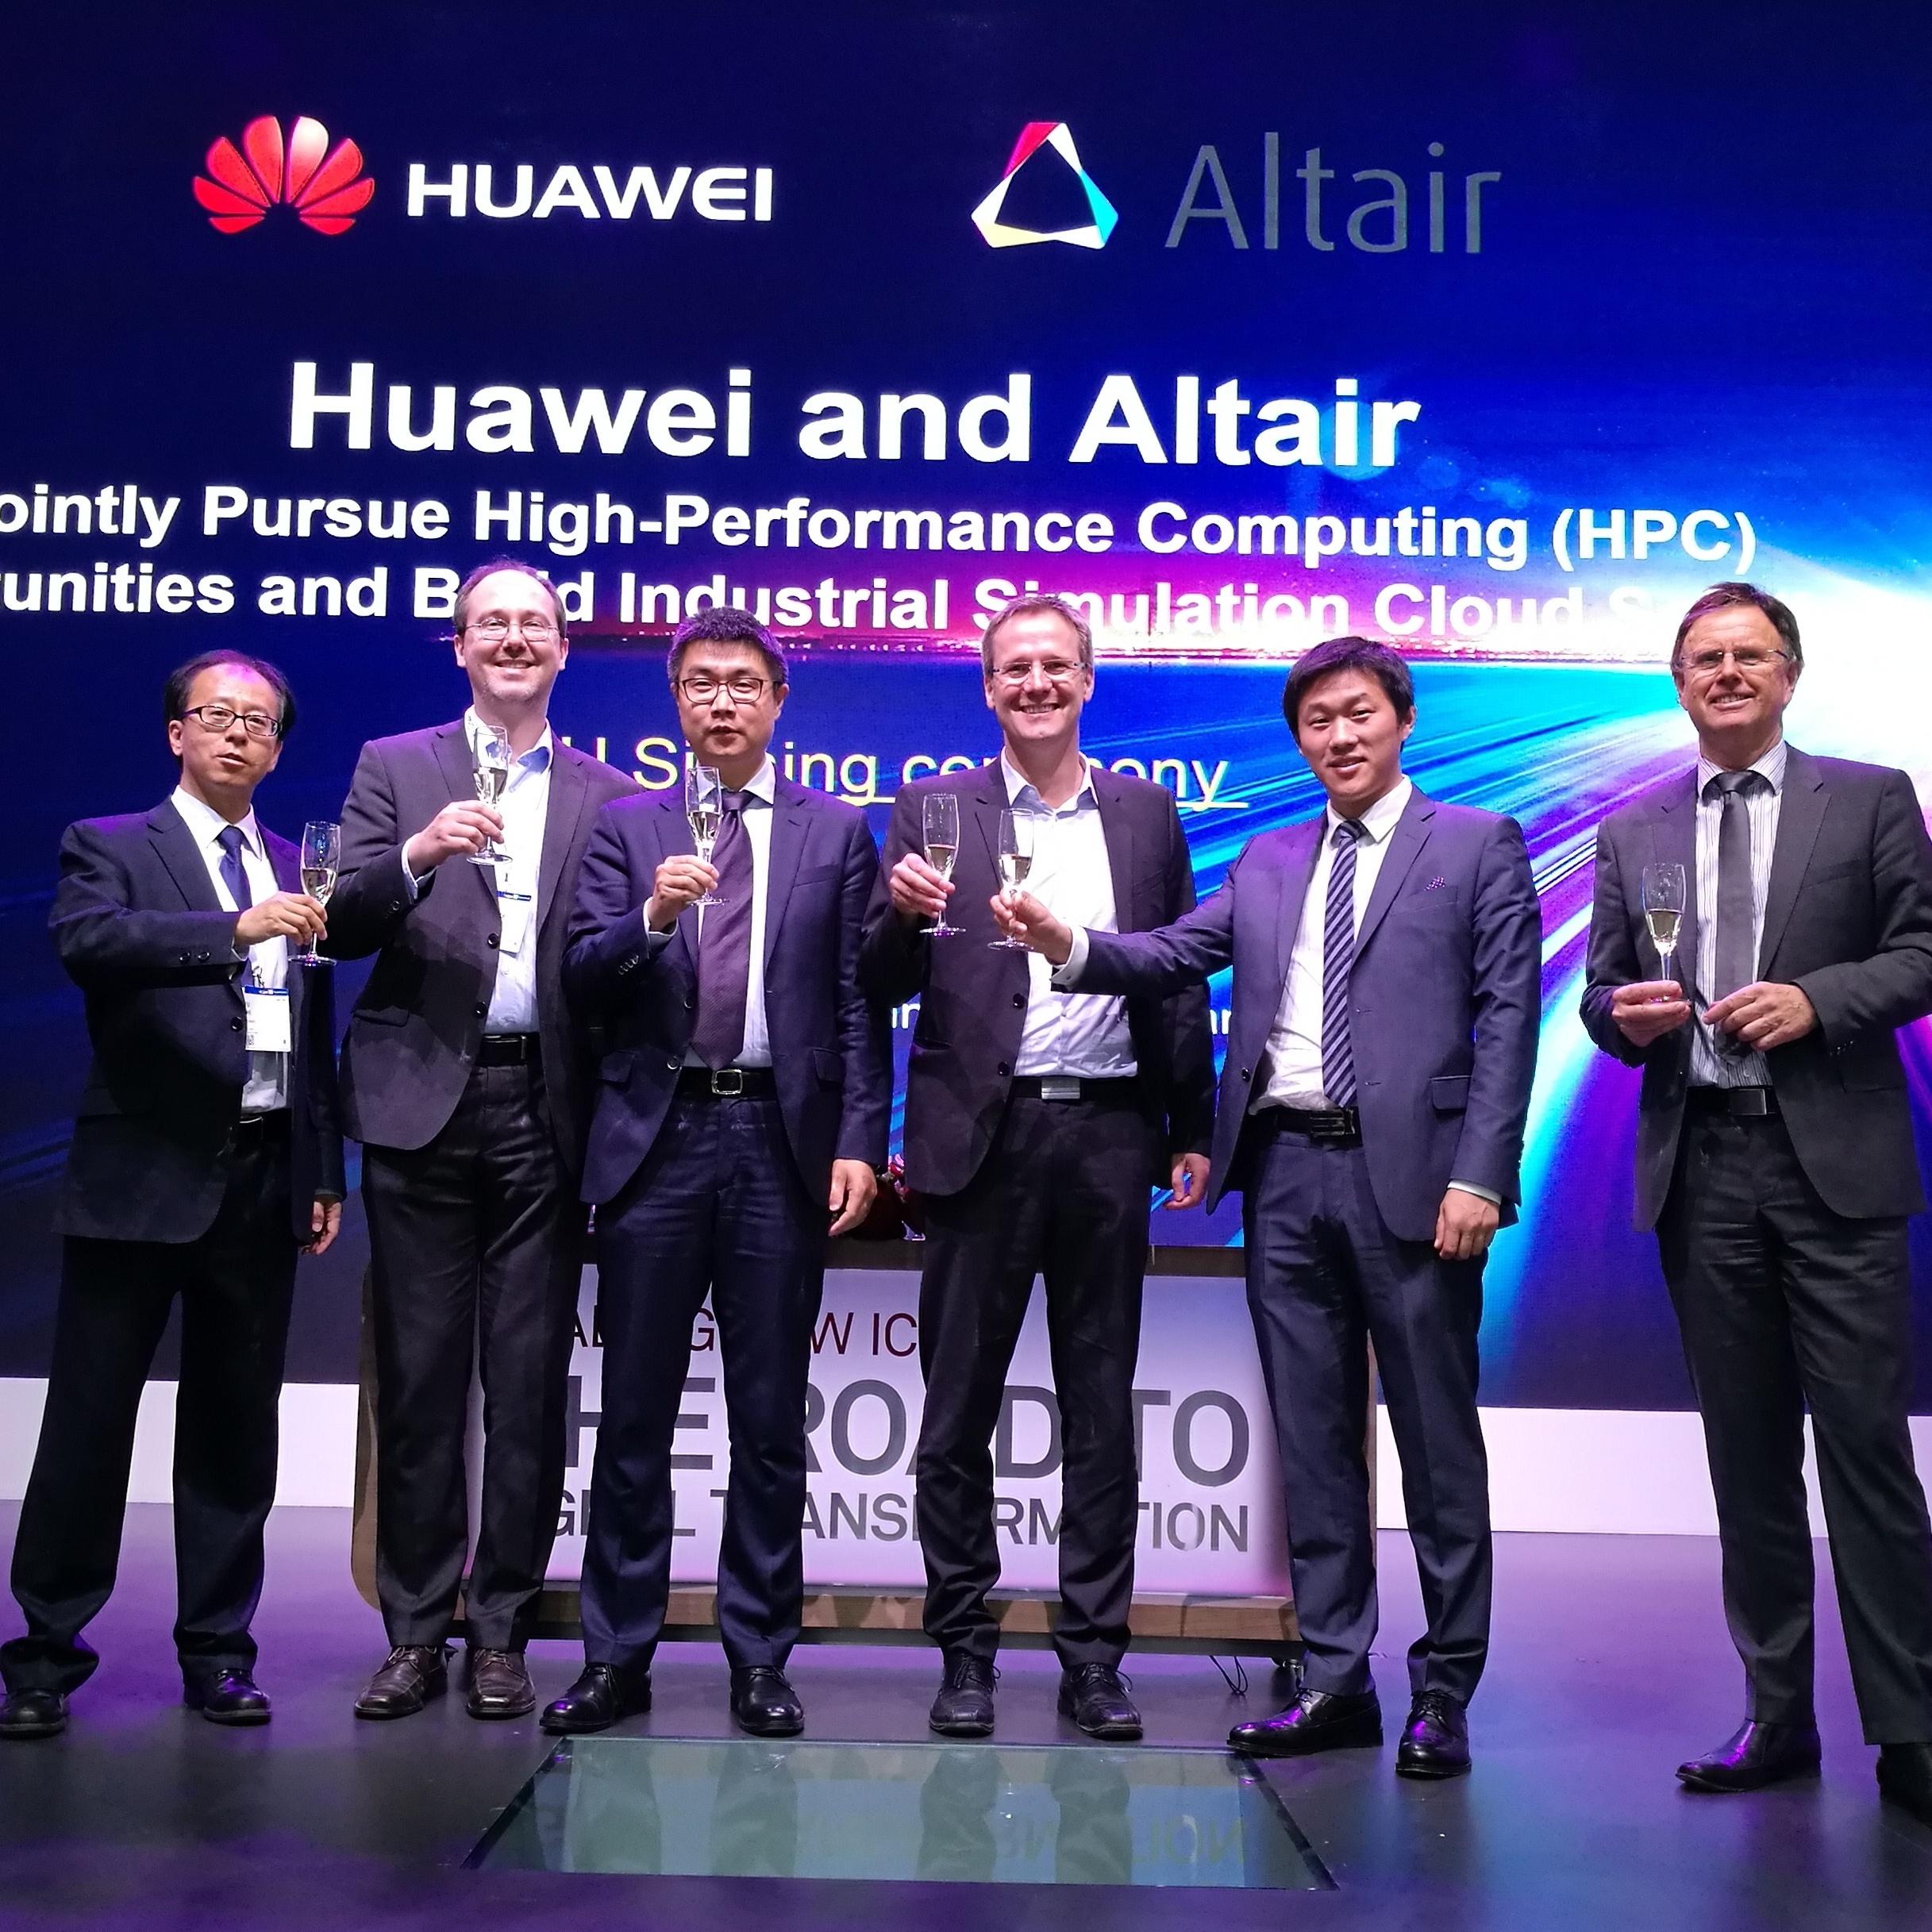 Huawei-457318-edited.jpg